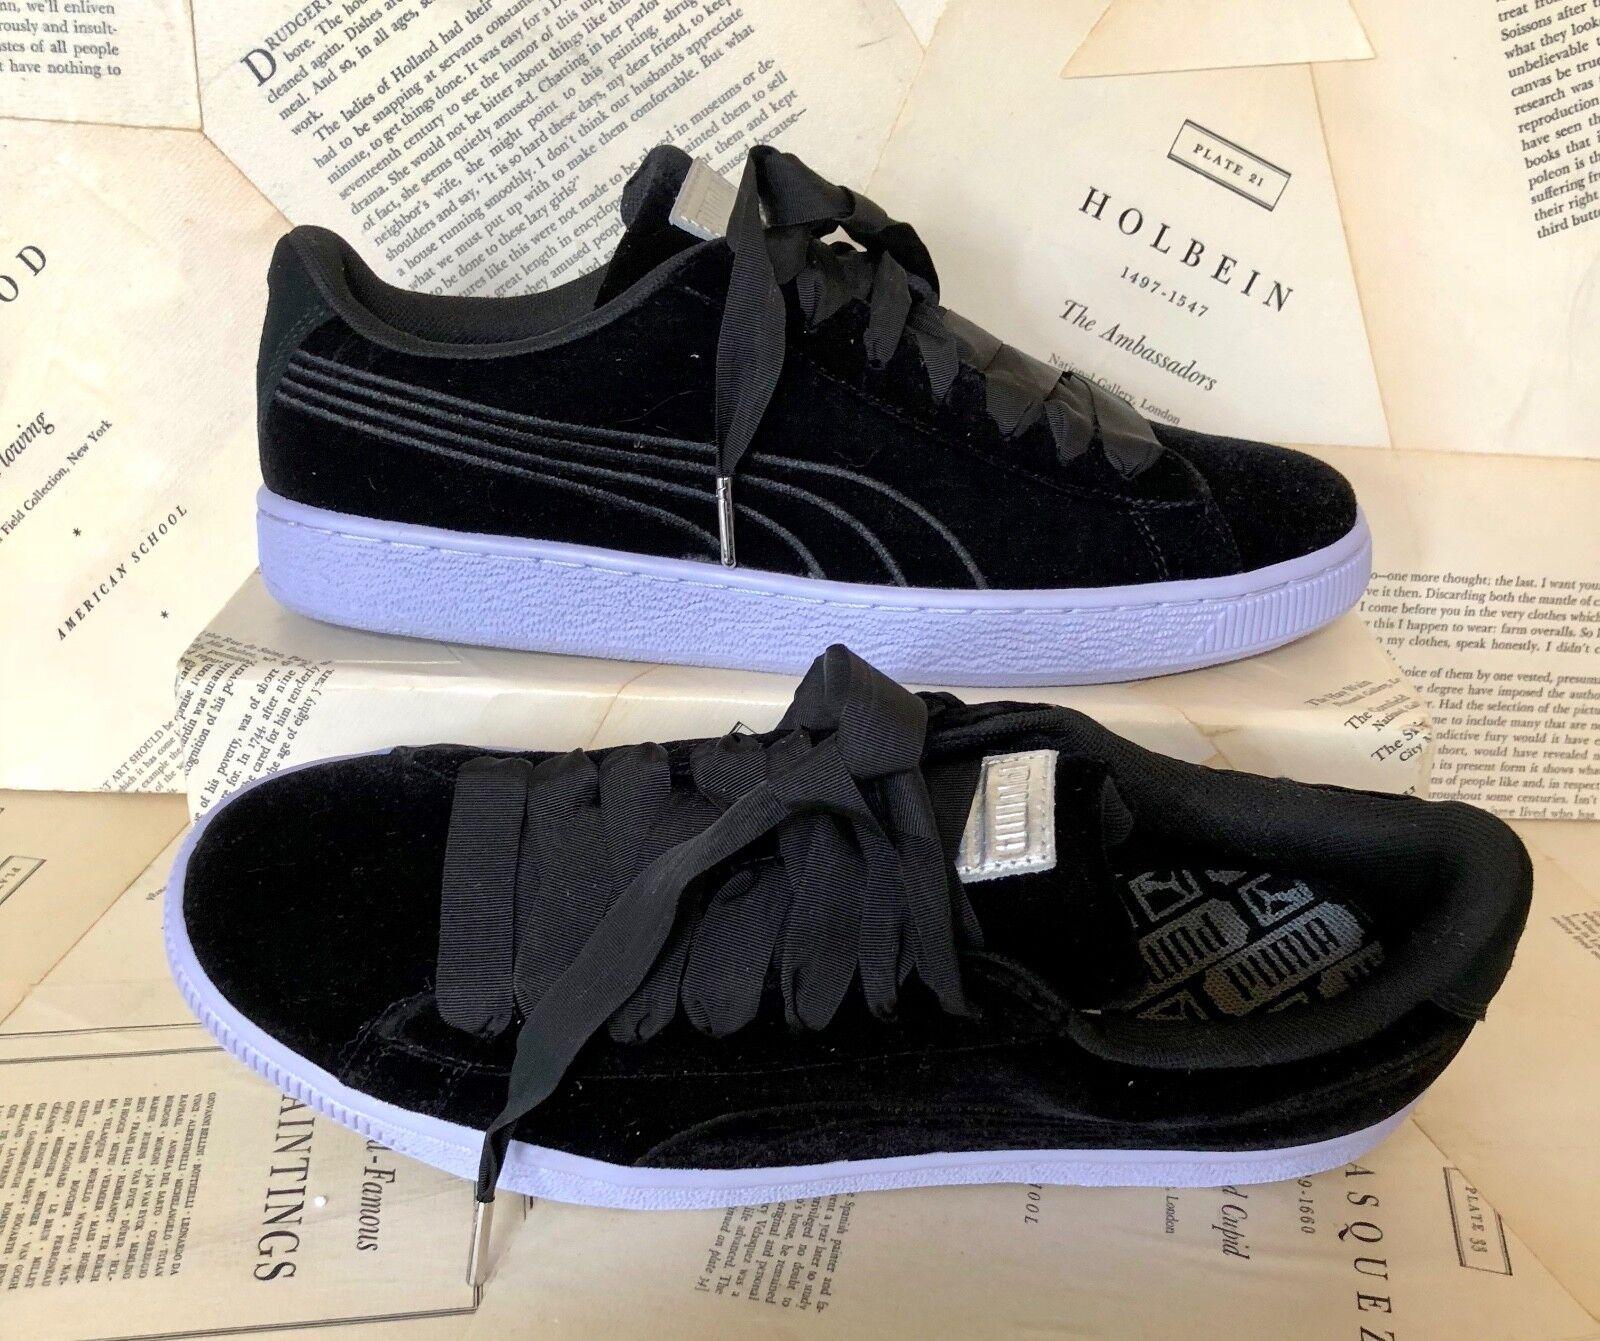 NEU Urban Outfitters Puma schwarz Velvet Ribbon Lace Sneakers 41/ 10